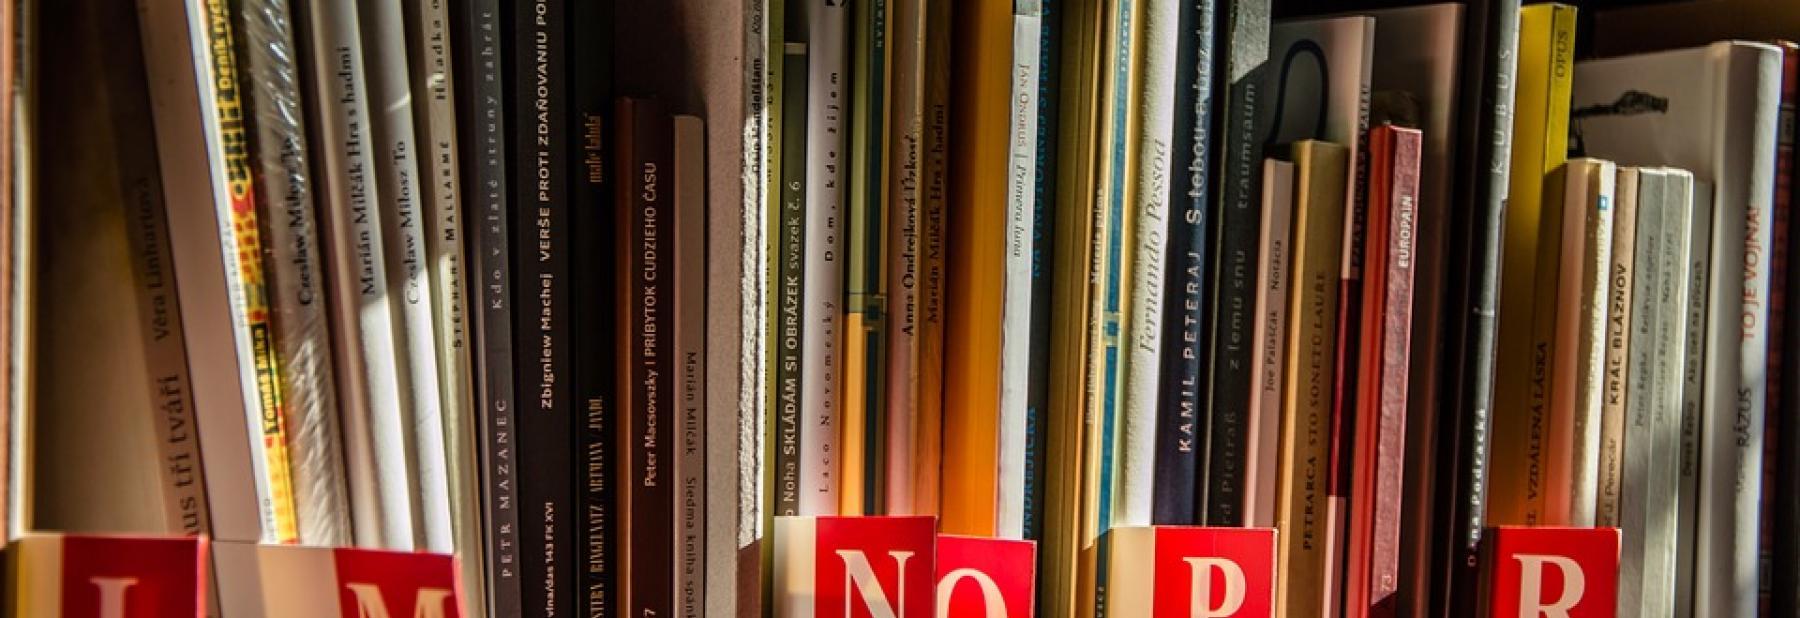 books-1204038_960_720